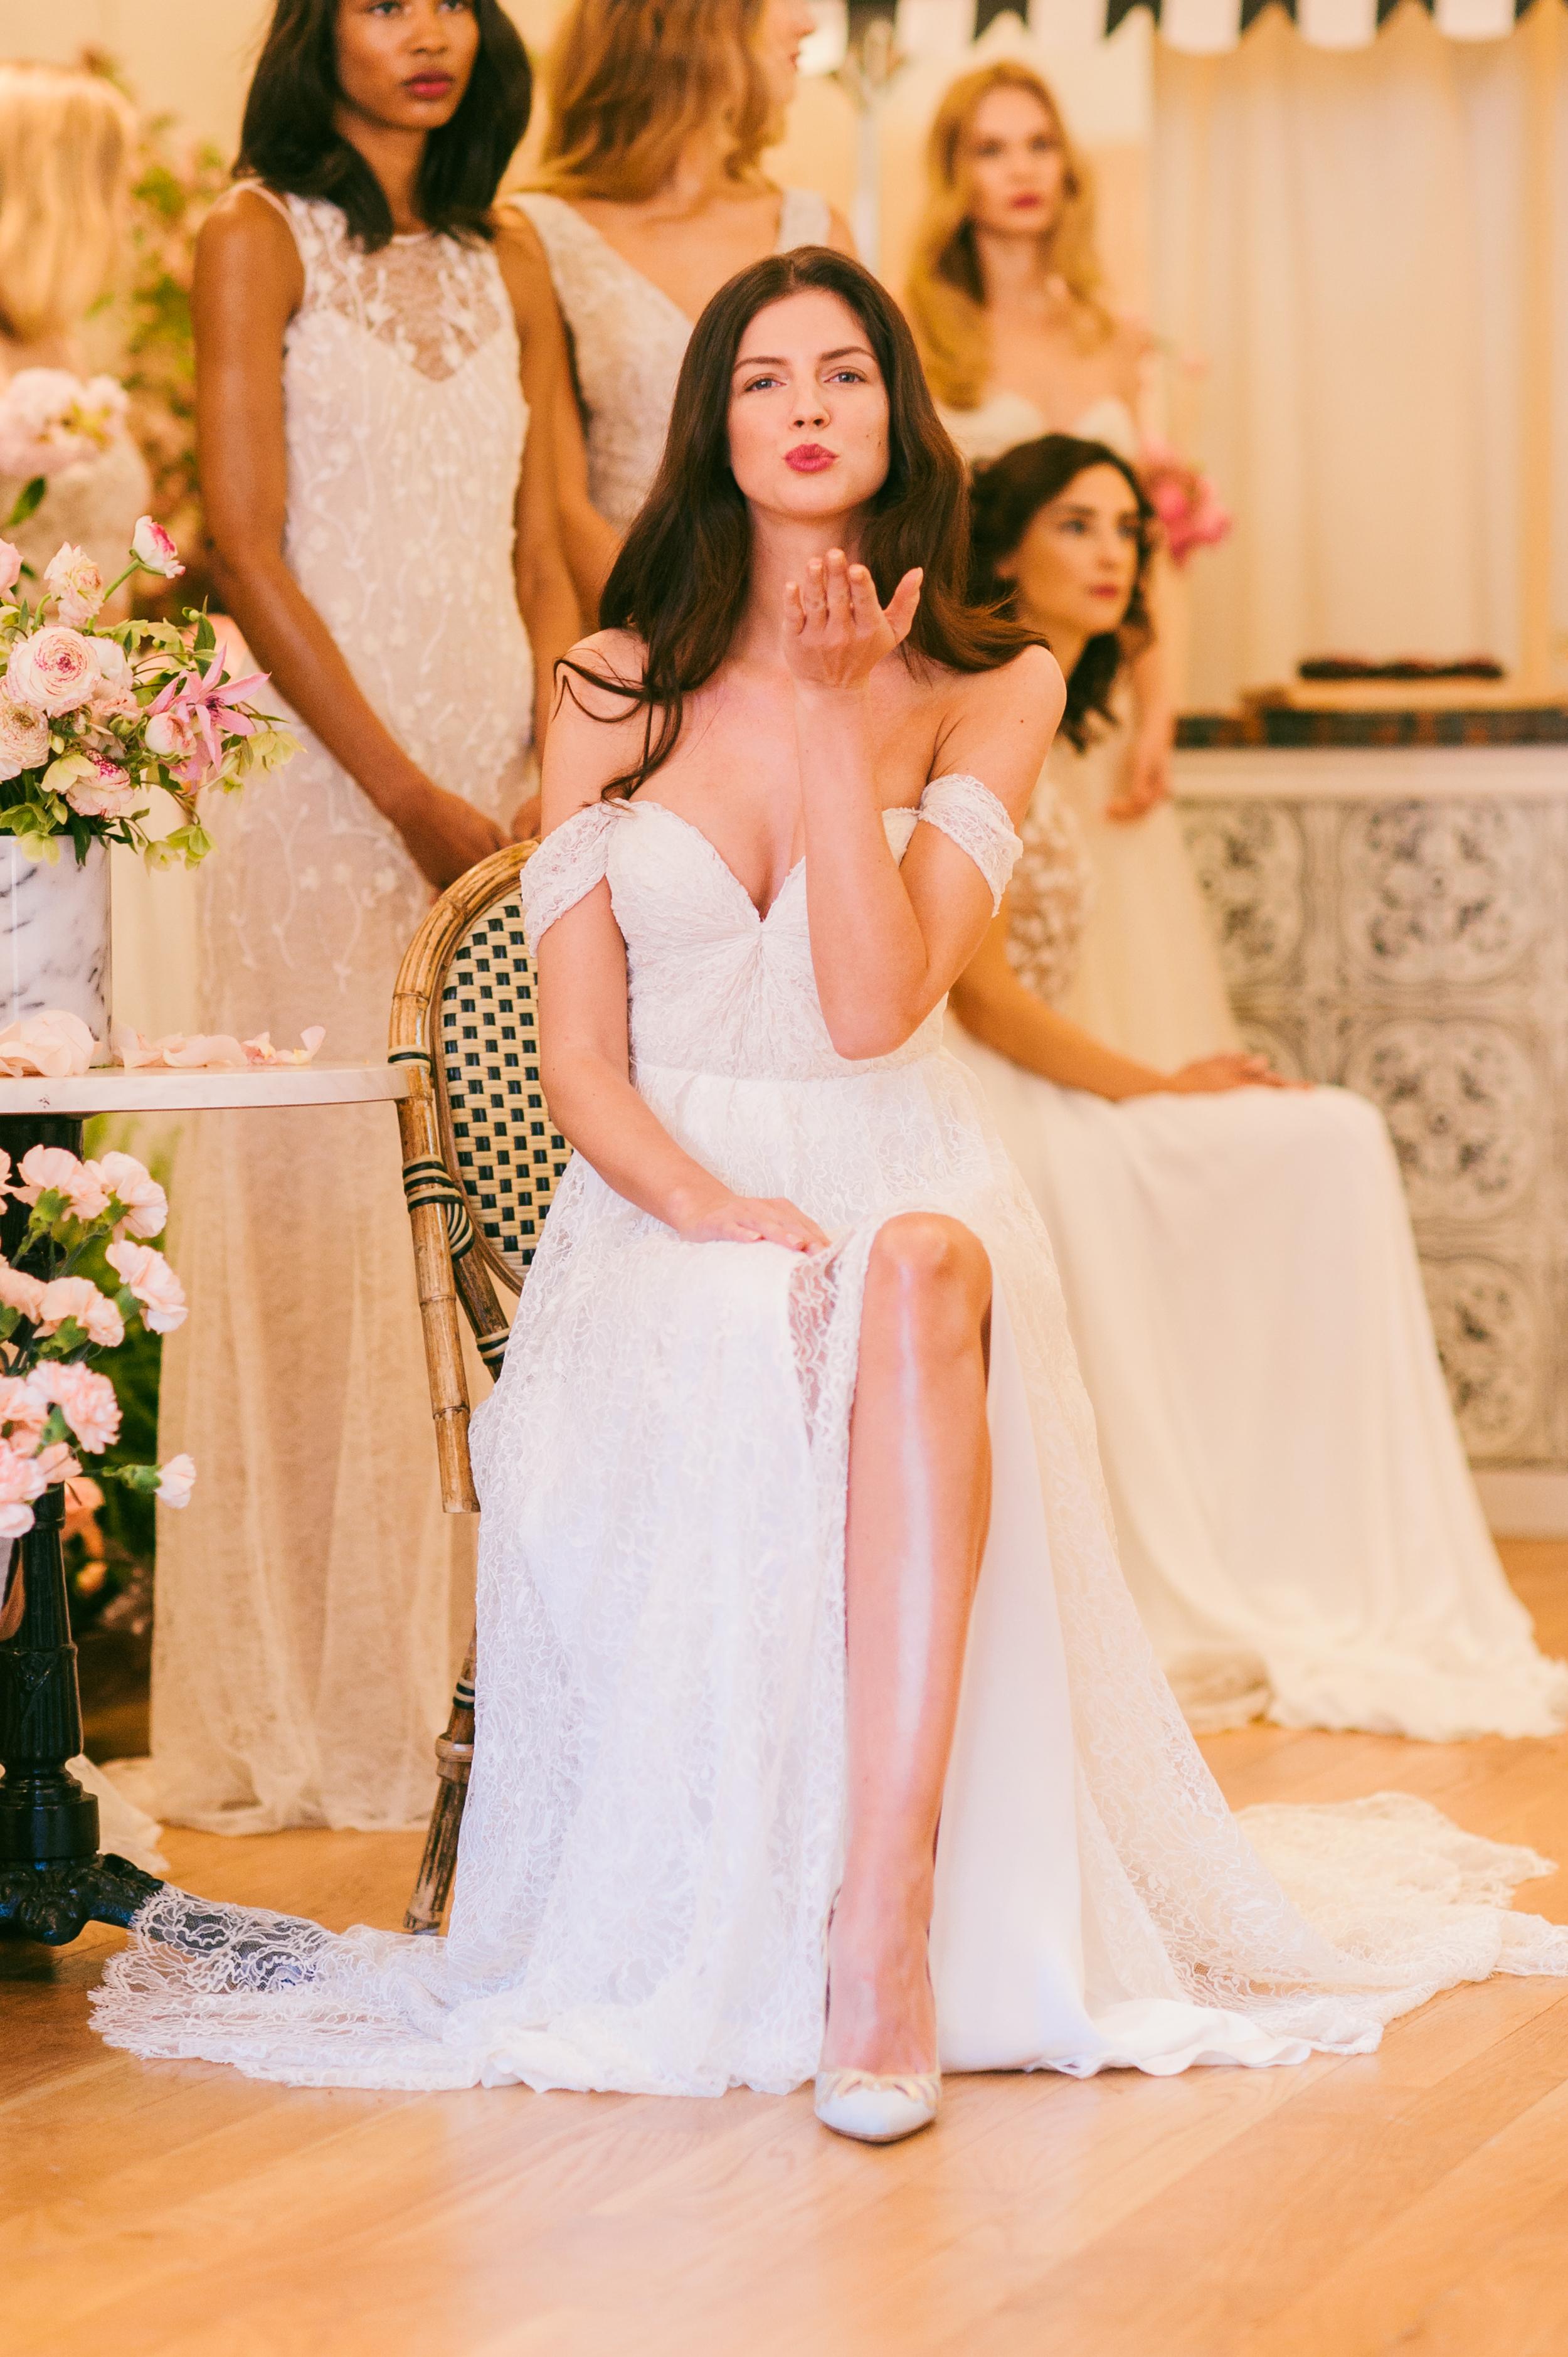 SarahSeven.Romantics.Bridal.15.jpg